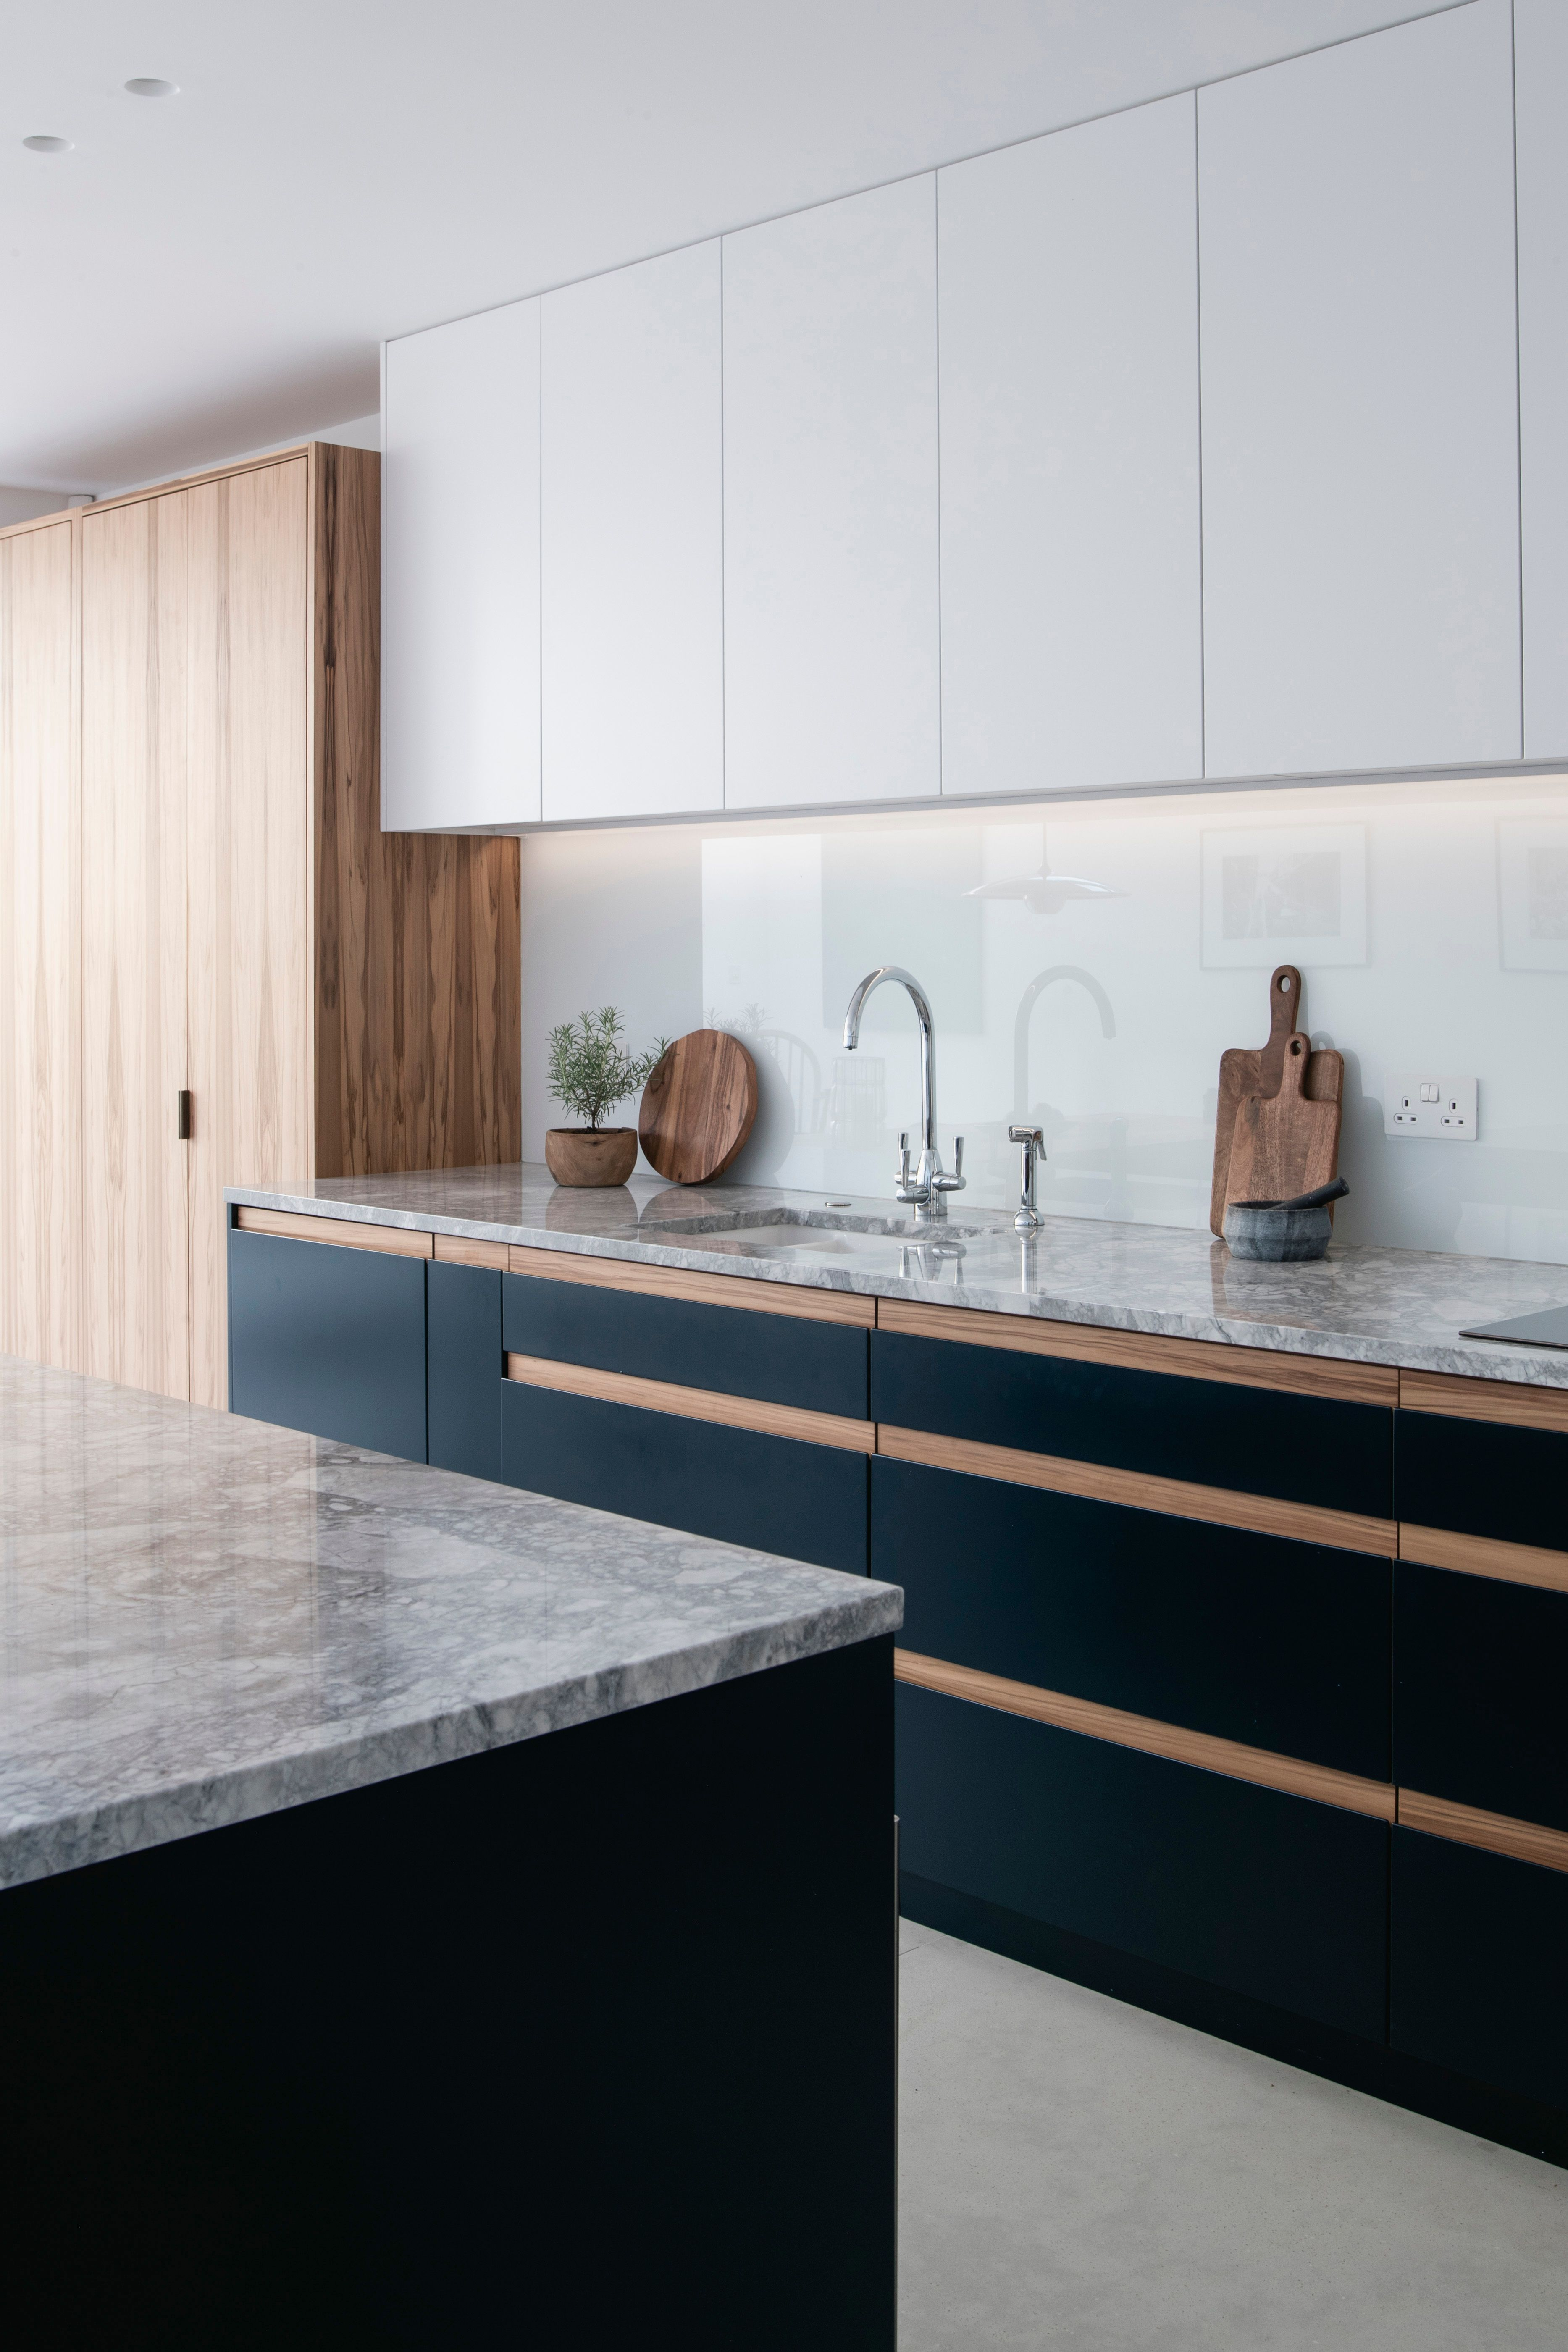 Deep Blue Bespoke Kitchen Cabinets With Satin Walnut Recessed Handles Brazilian Deep Bespoke Kitchen Cabinets Glass Kitchen Cabinets New Kitchen Cabinets